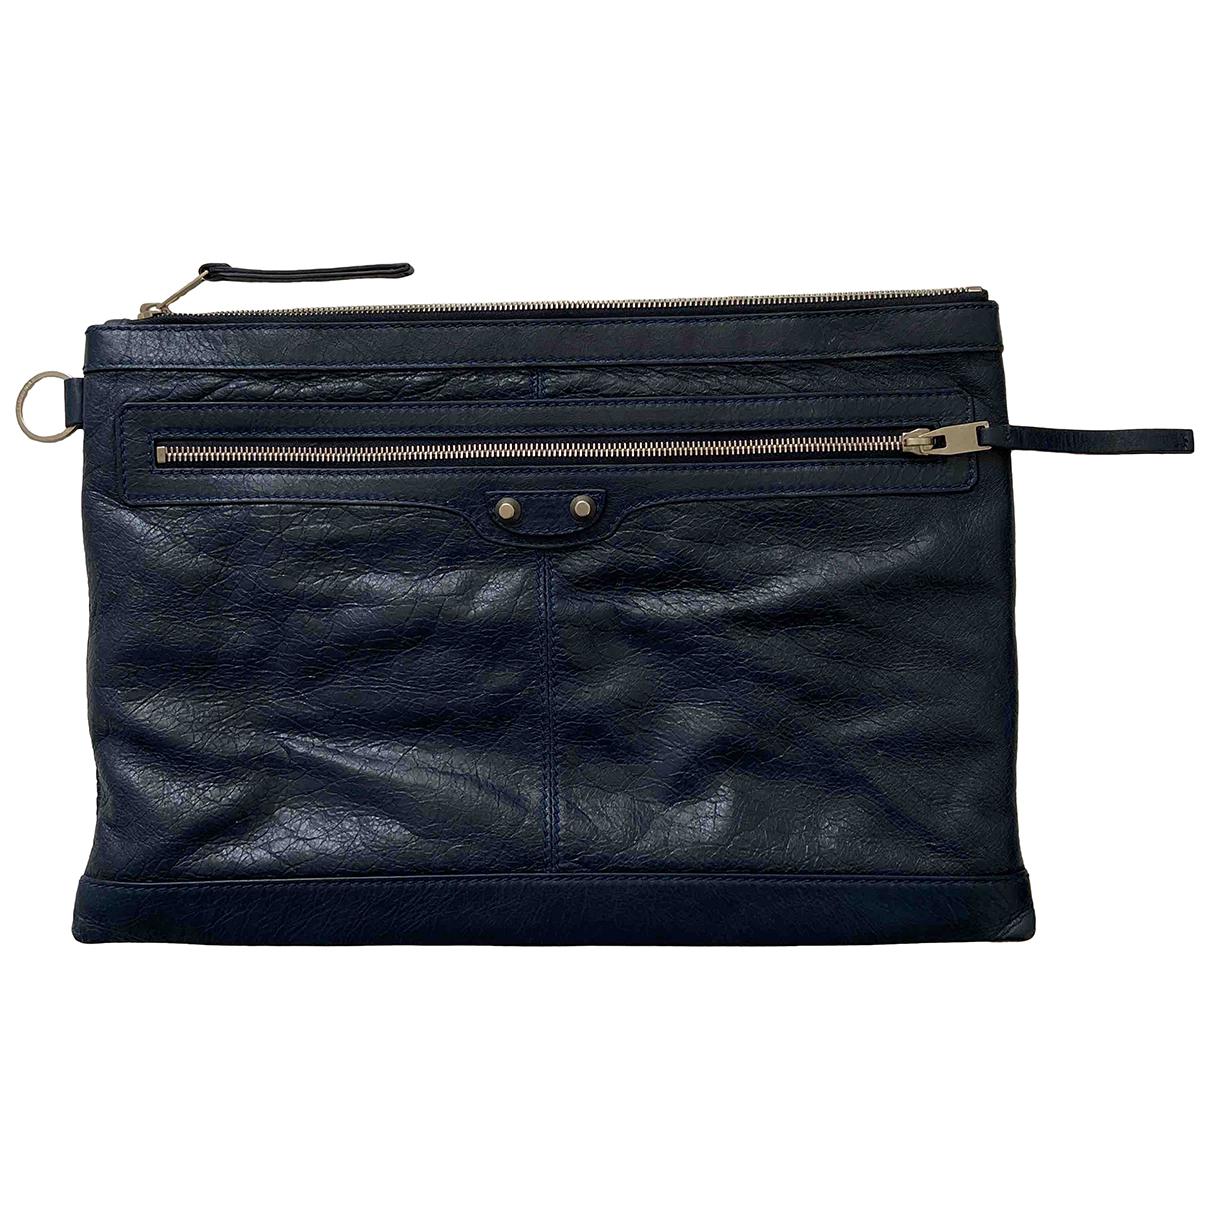 Balenciaga N Blue Leather bag for Men N